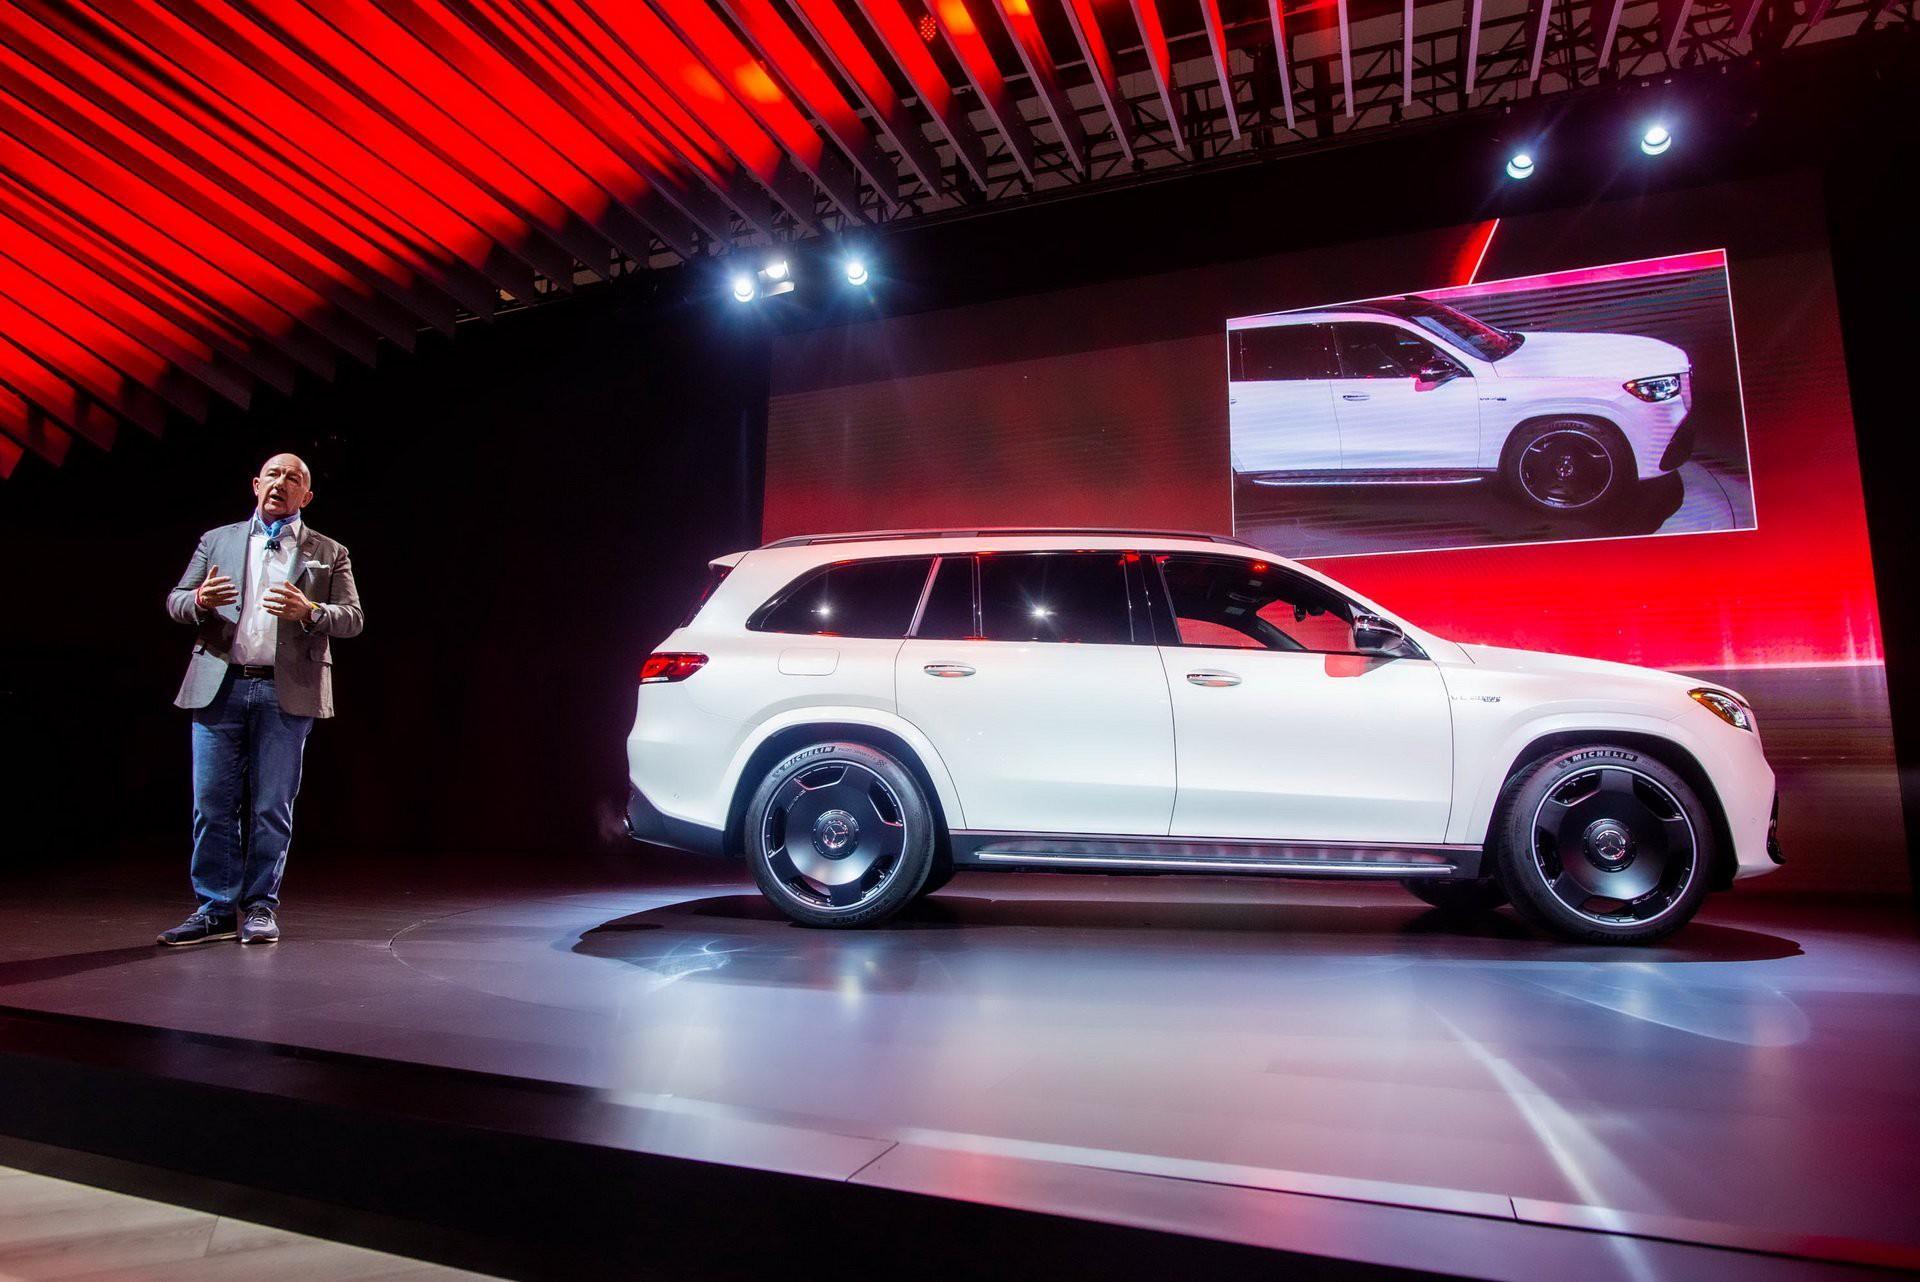 Khám phá Mercedes GLS 63 2020 vừa ra mắt Ảnh 1